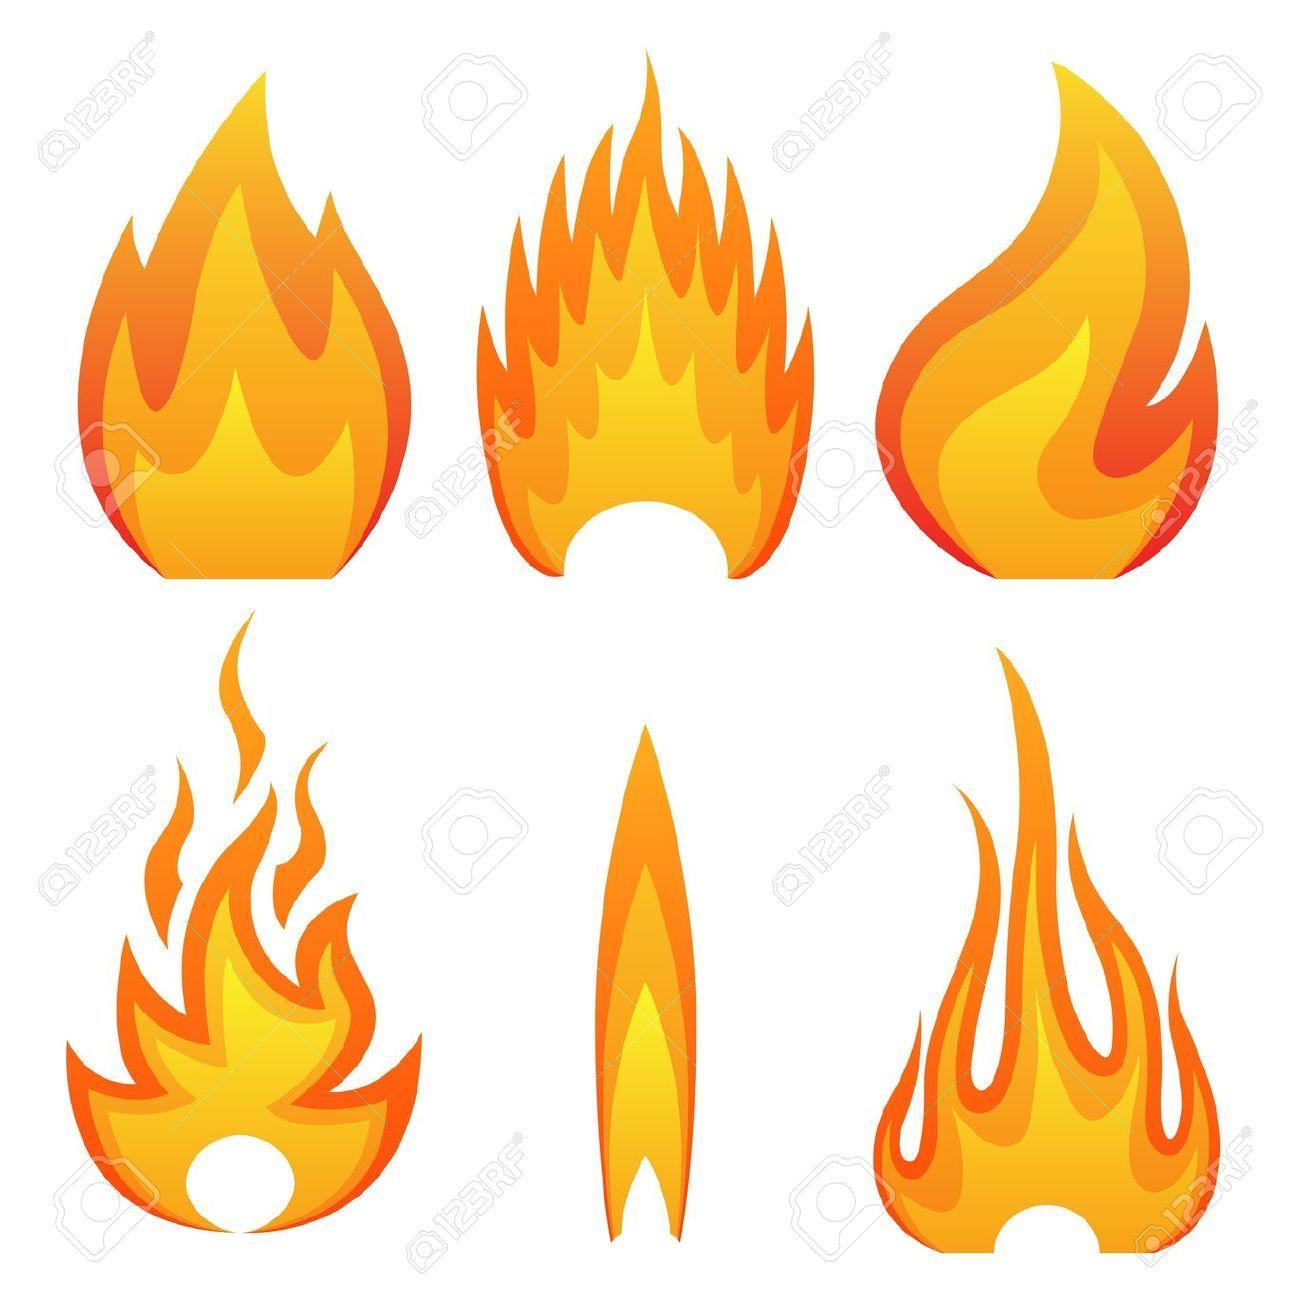 Fire and Ice Heart Ice heart, Fire, ice, Fire heart